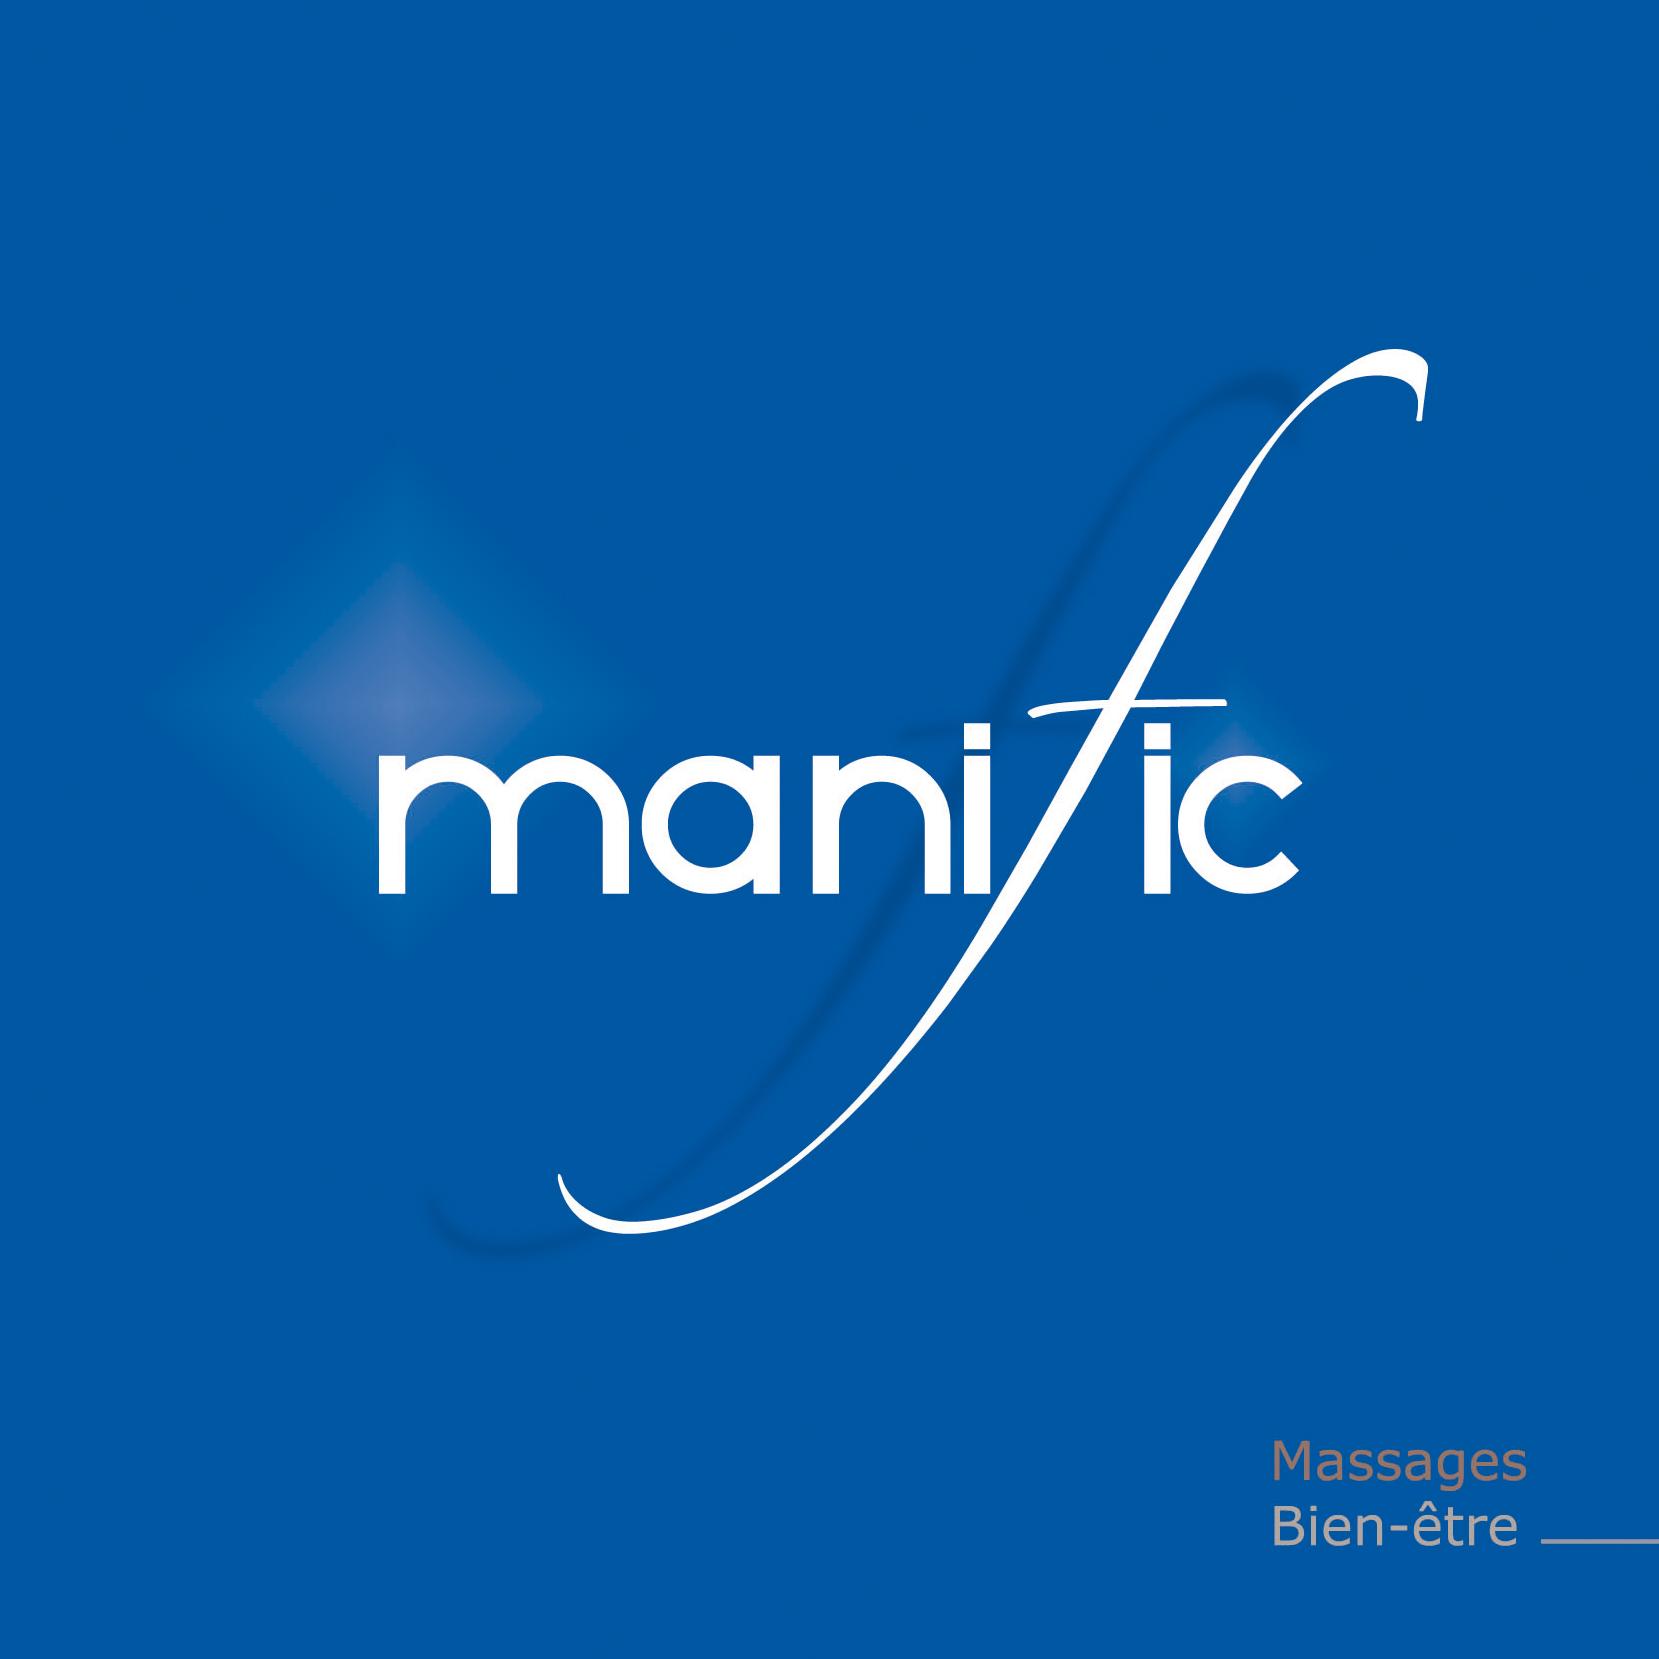 https://static.blog4ever.com/2012/11/720911/Manific-recto.jpg